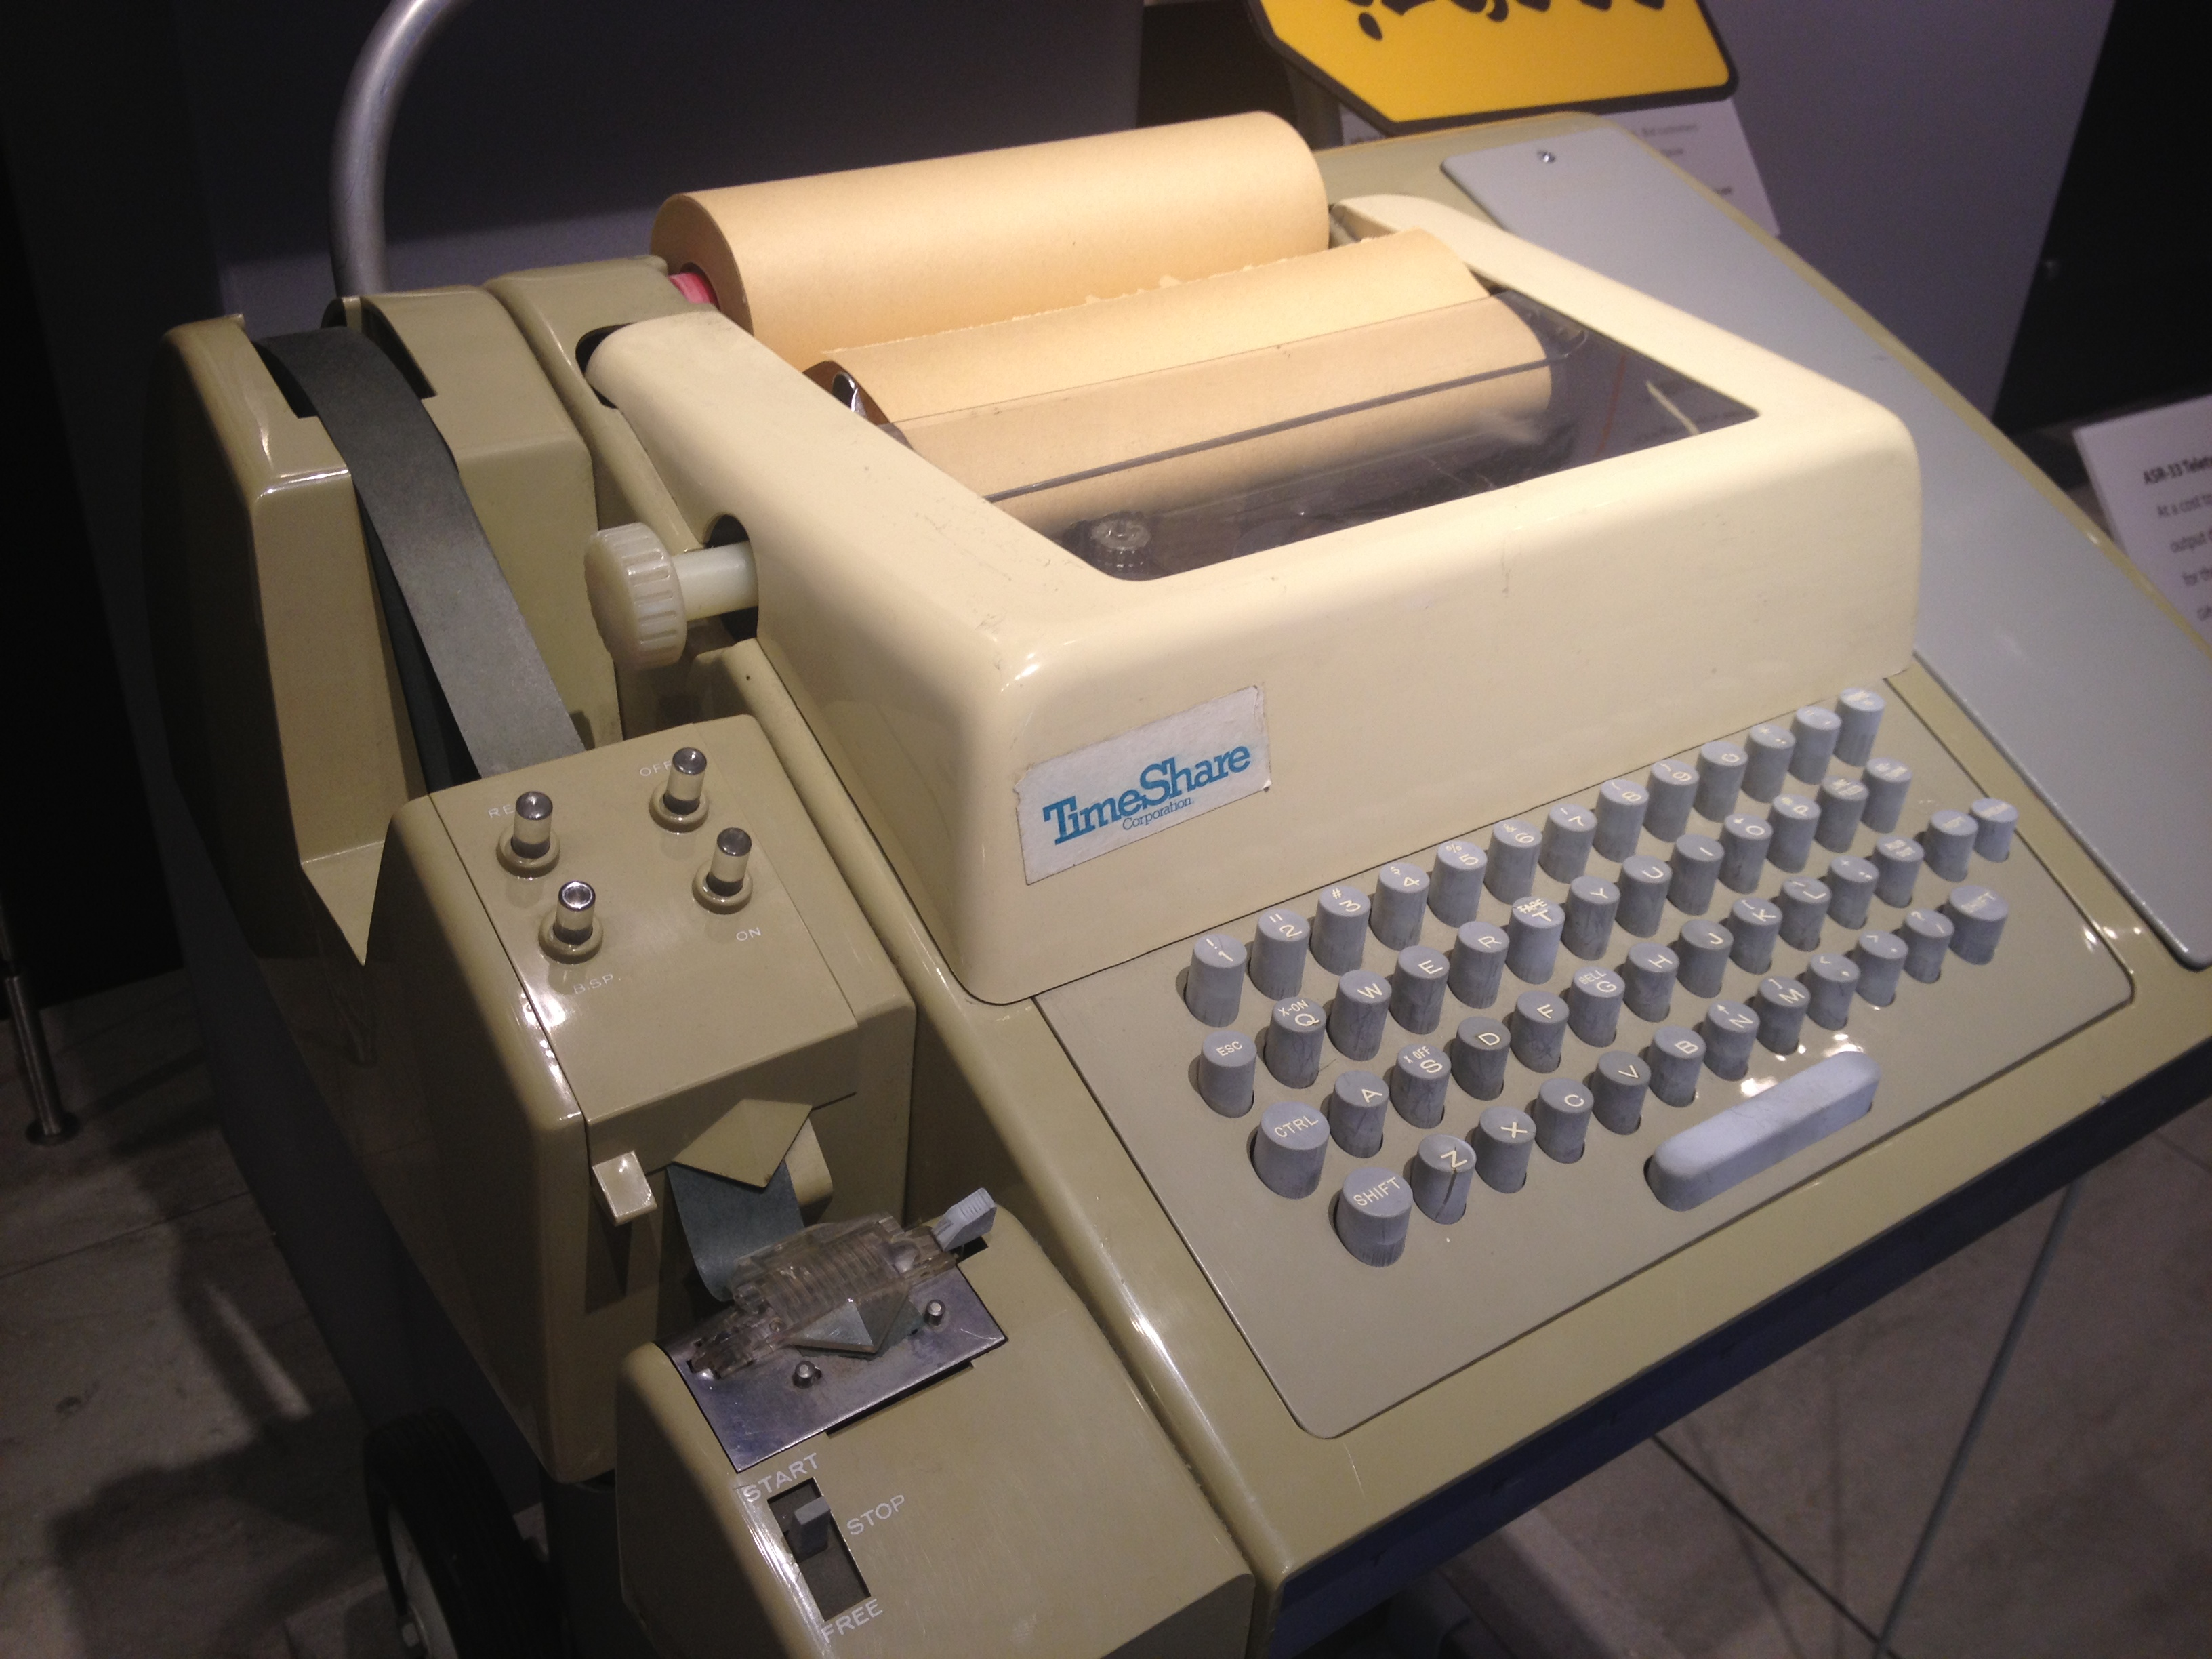 eletypeodel33teleprinter,withpunchedtapereaderandpunch,usableasacomputerterminal